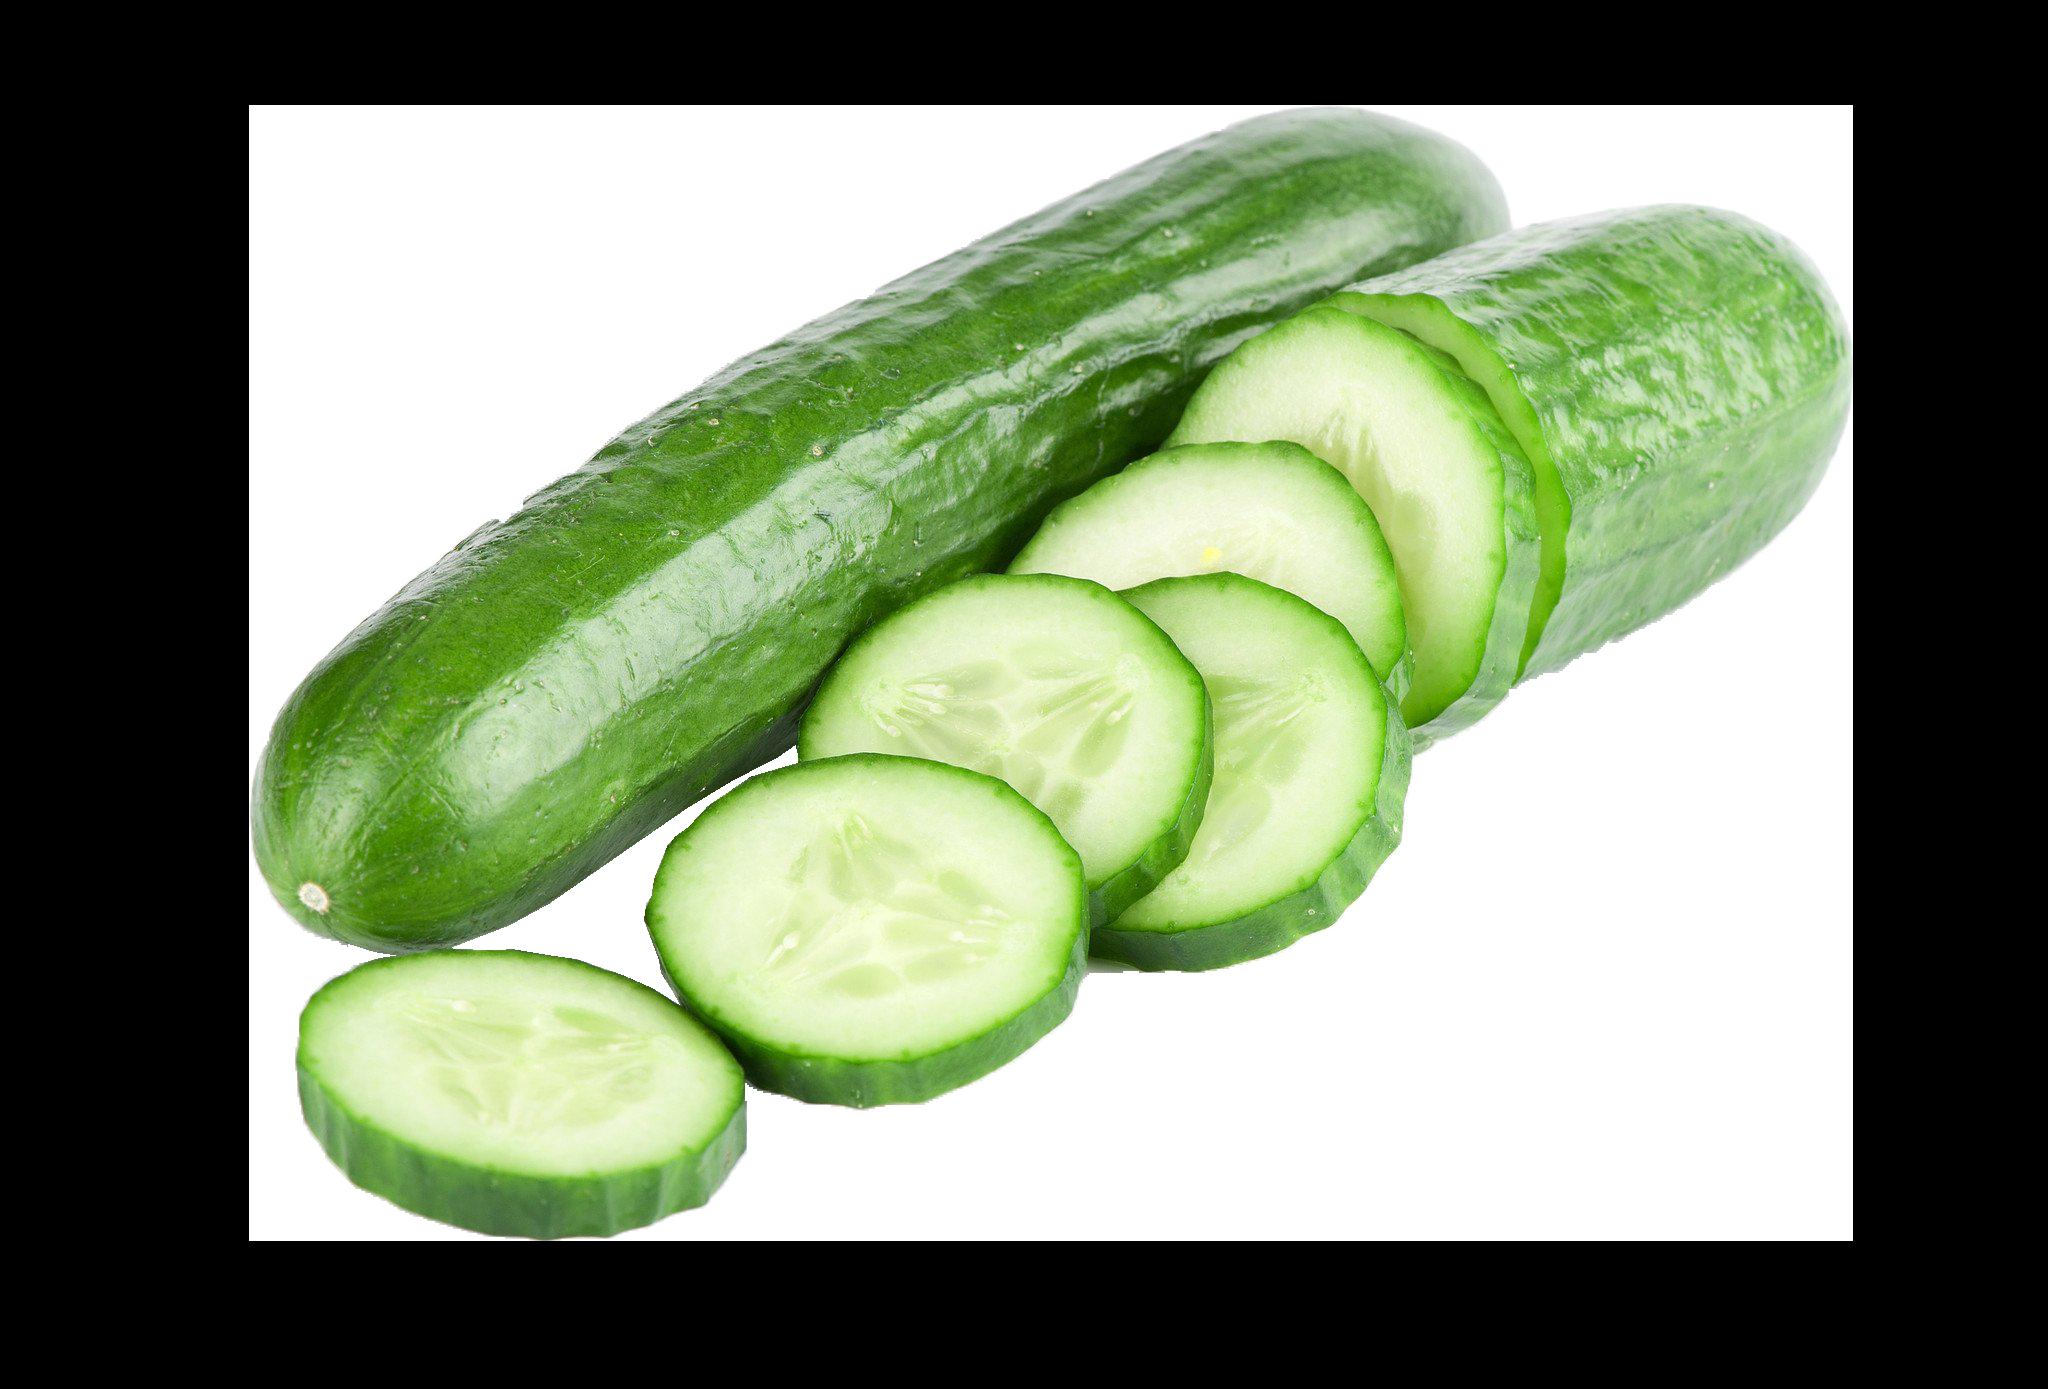 Cucumber PNG Image